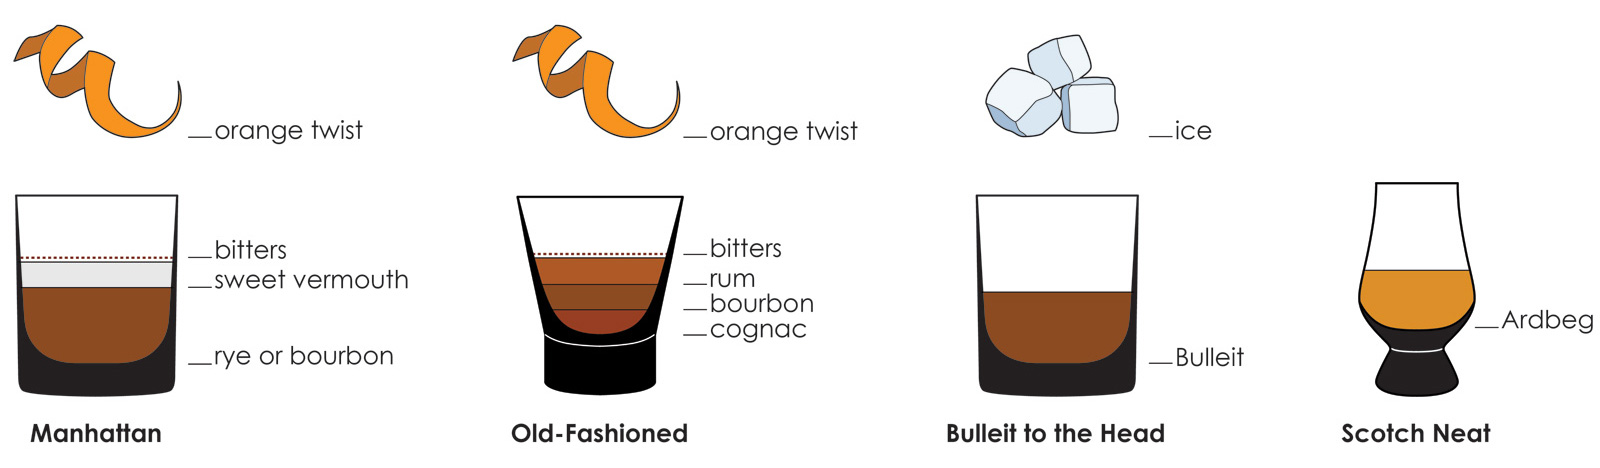 BUILD-Drinks-Row-One-short